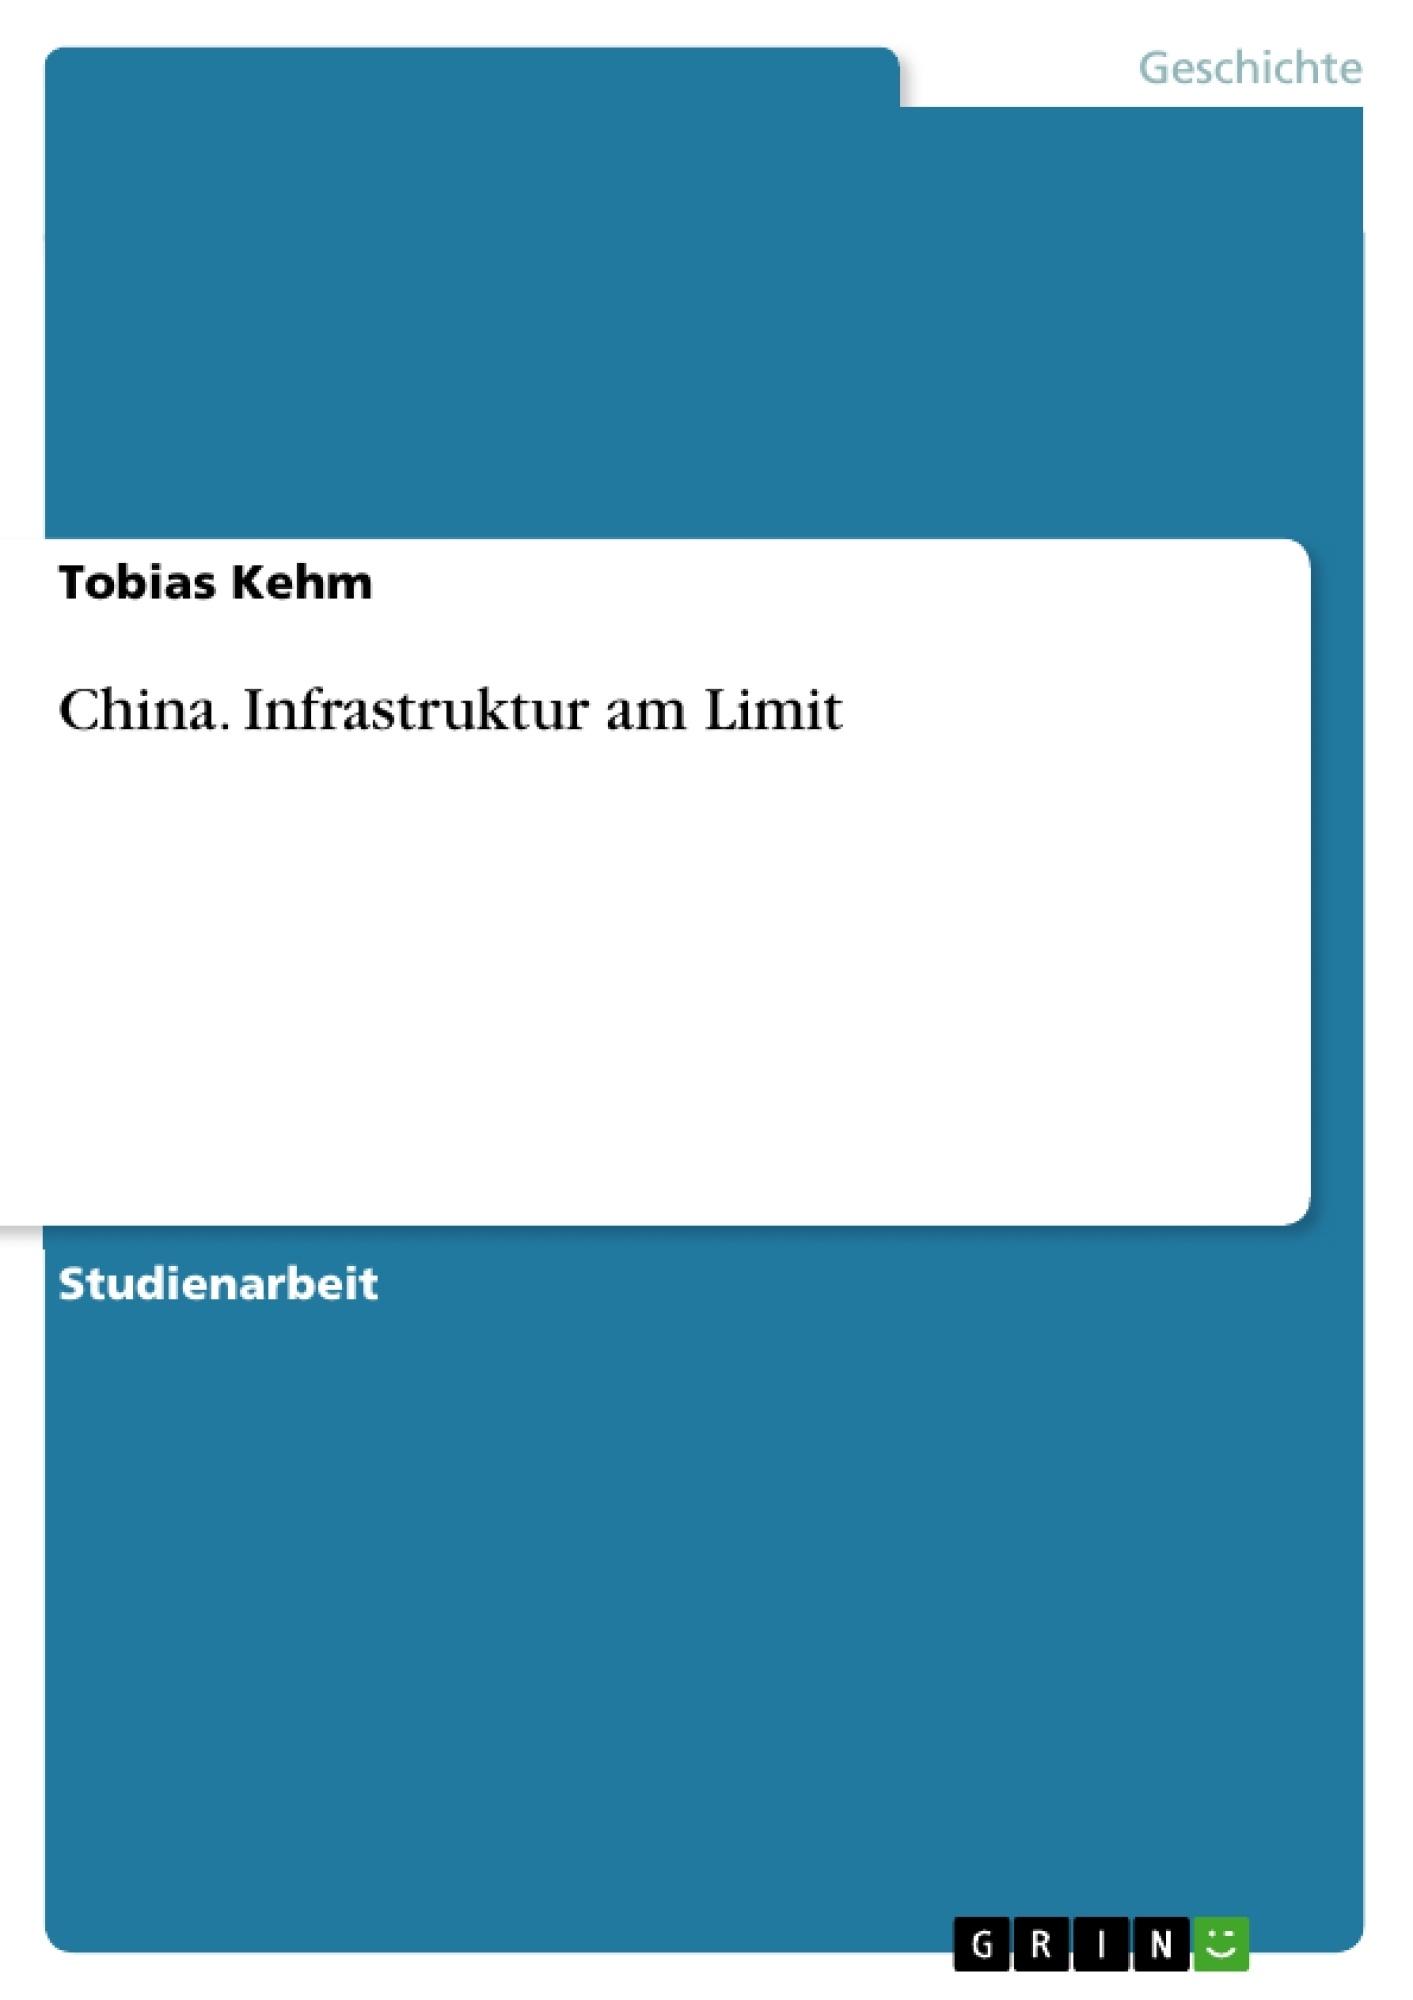 Titel: China. Infrastruktur am Limit